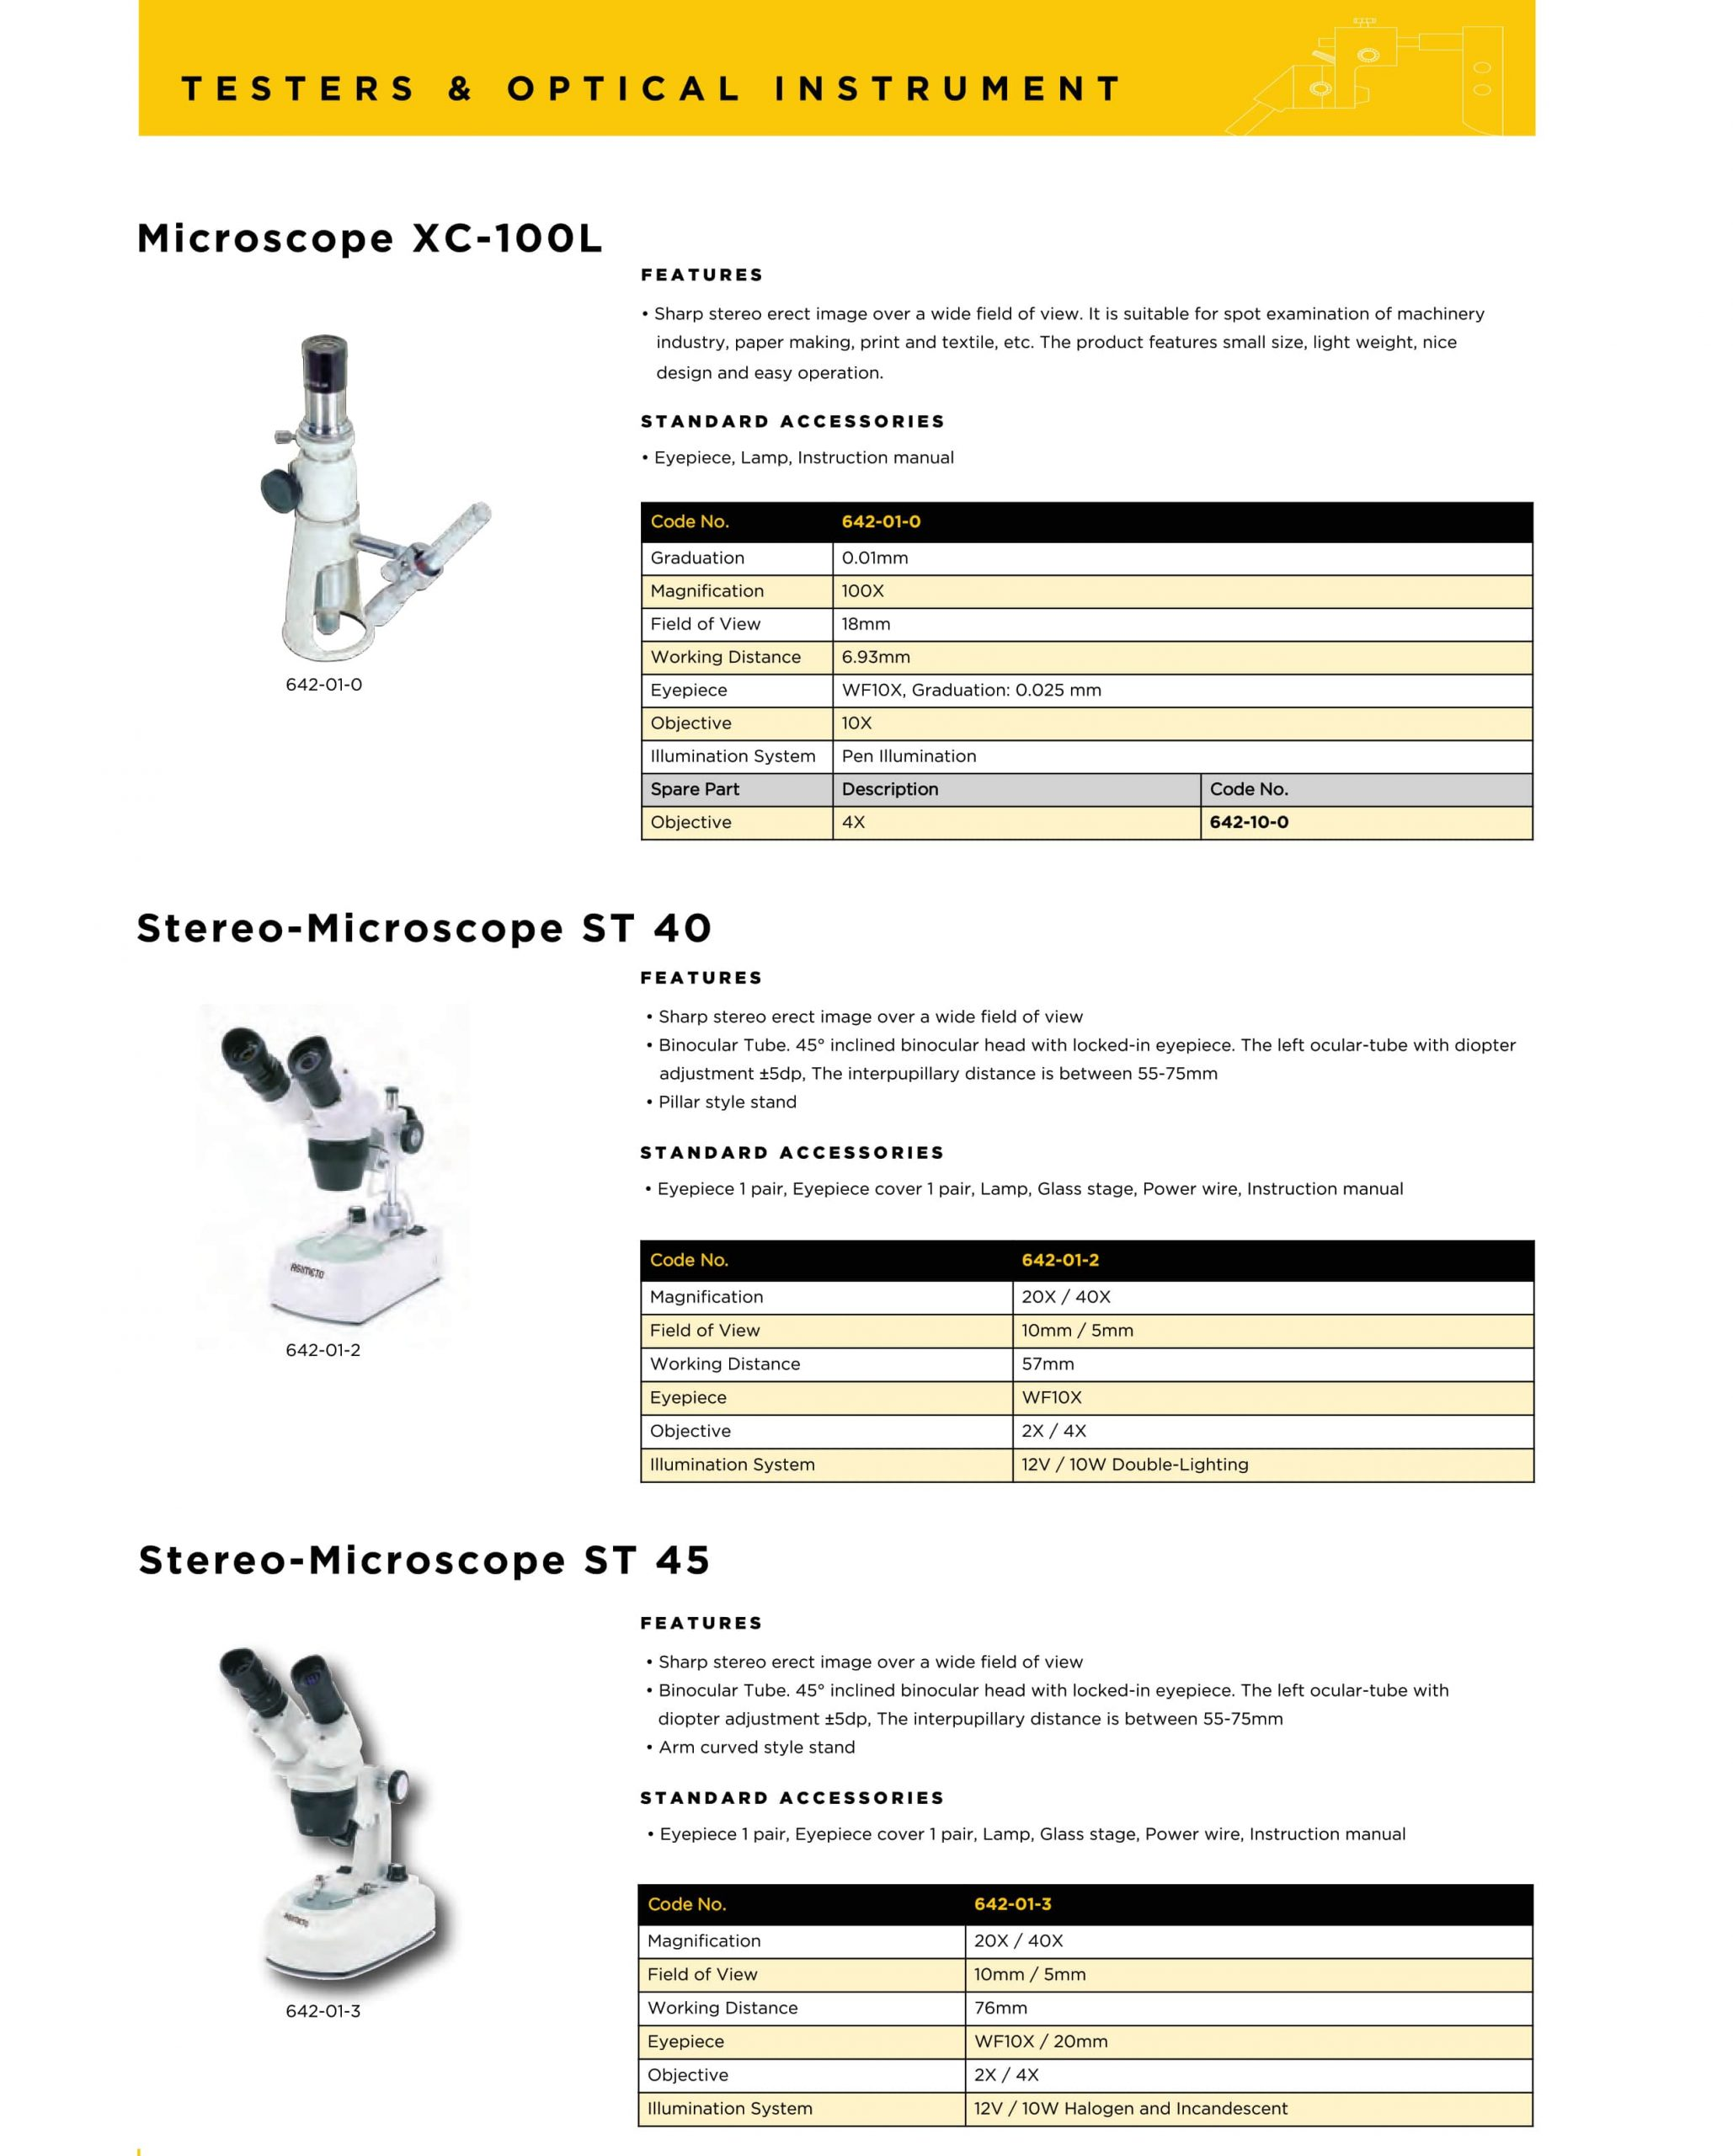 کاتالوگ میکروسکوپ آسیمتو asimeto